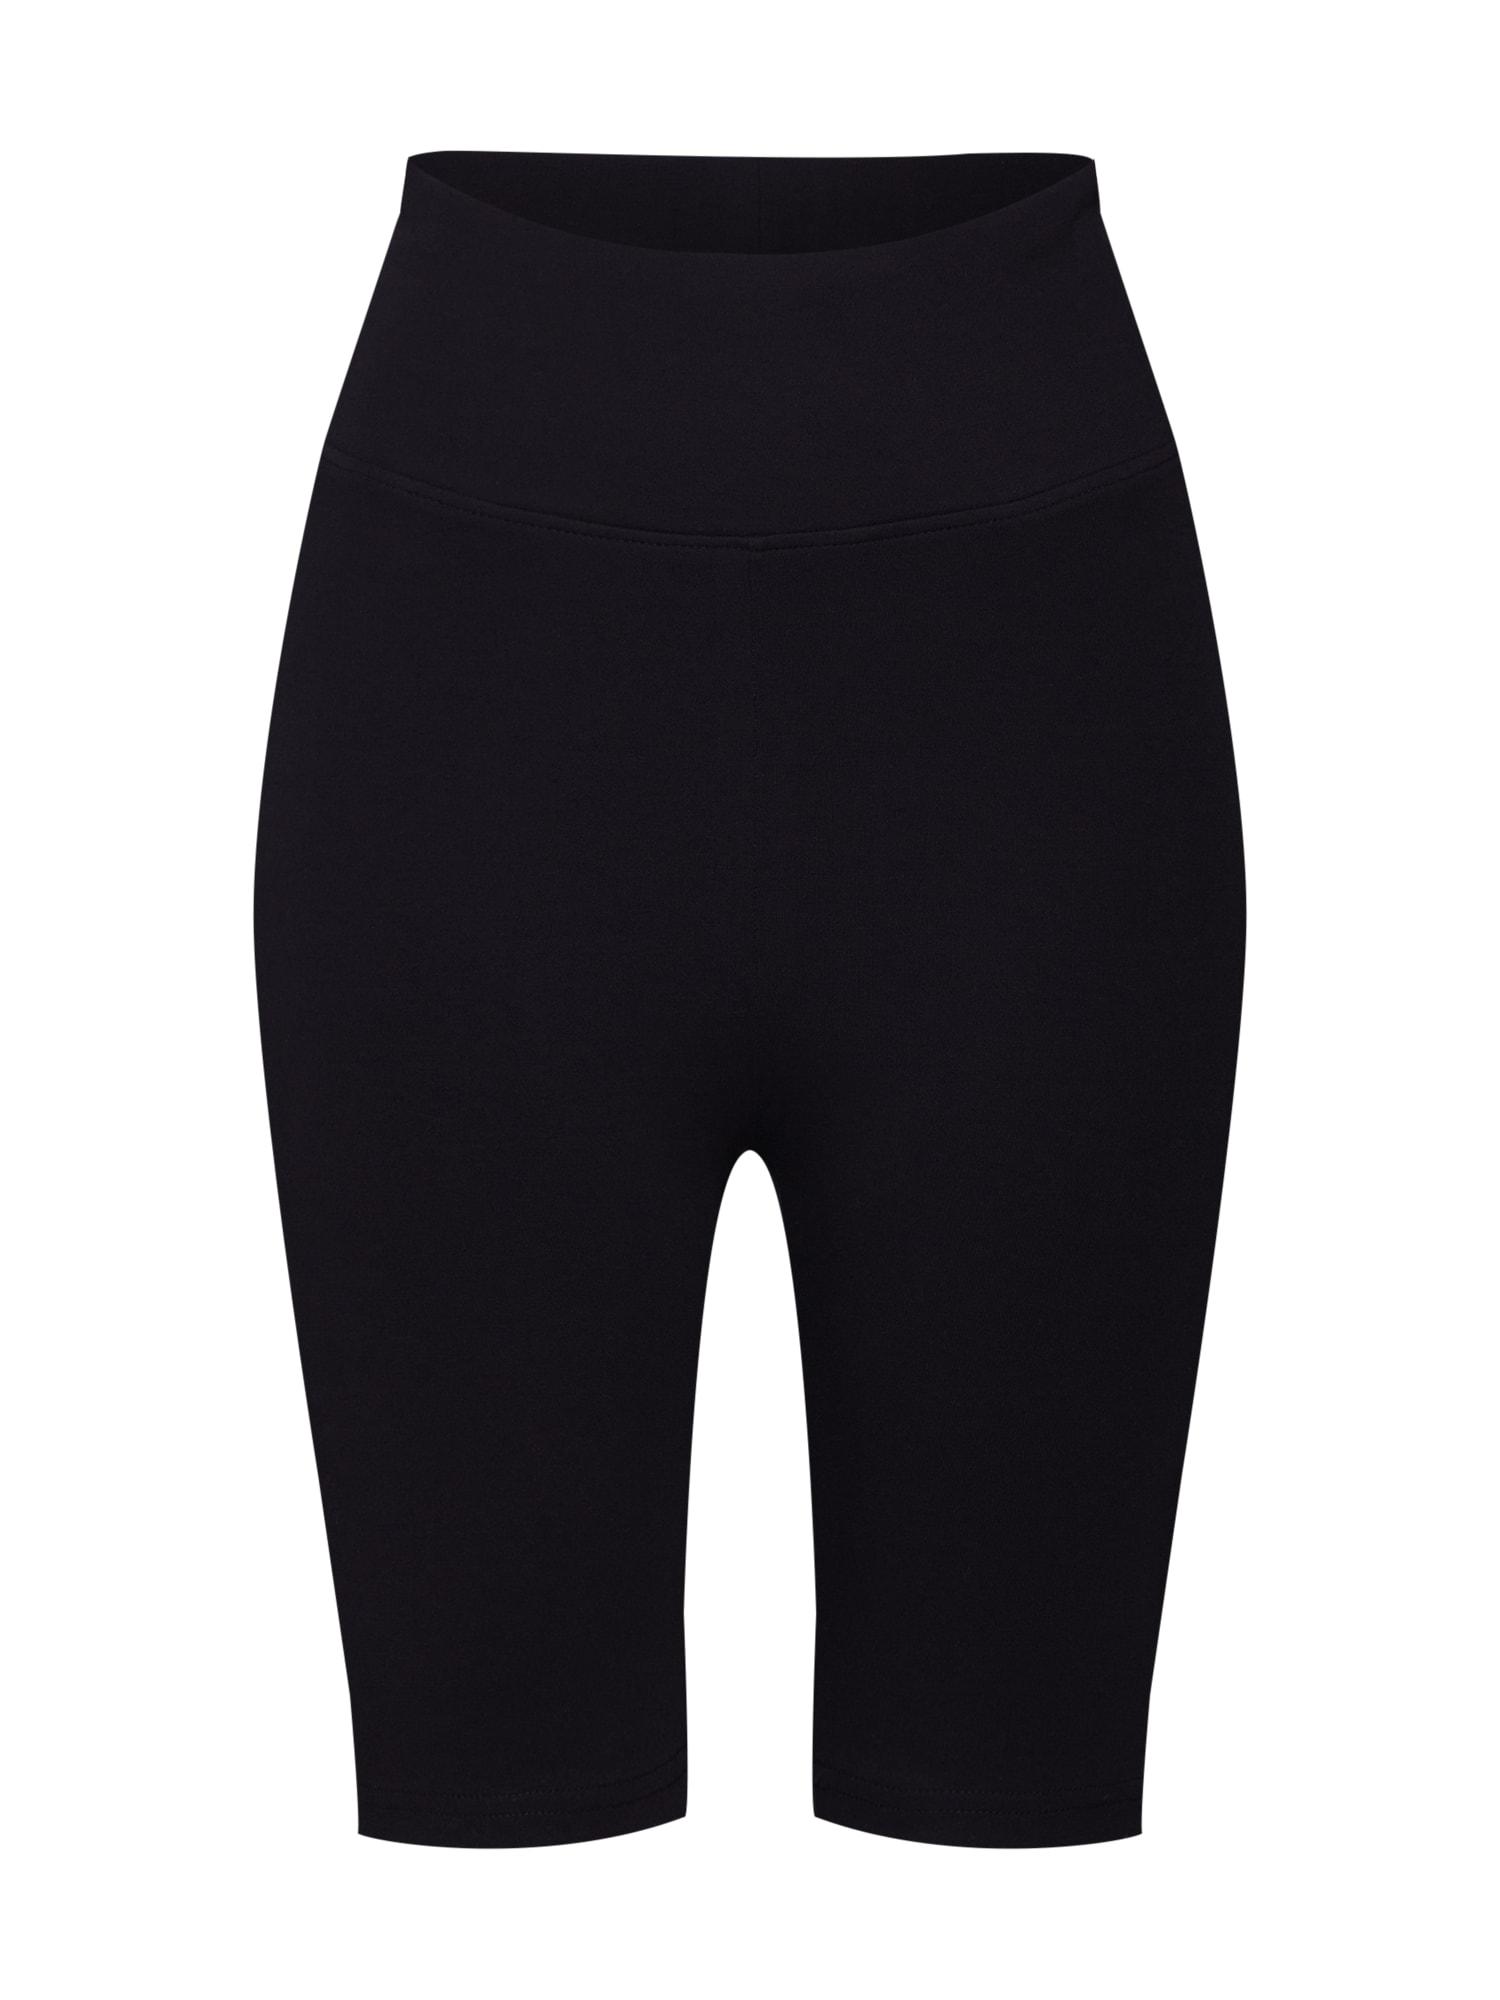 Urban Classics Leggings 'Ladies High Waist Cycle Shorts'  negru